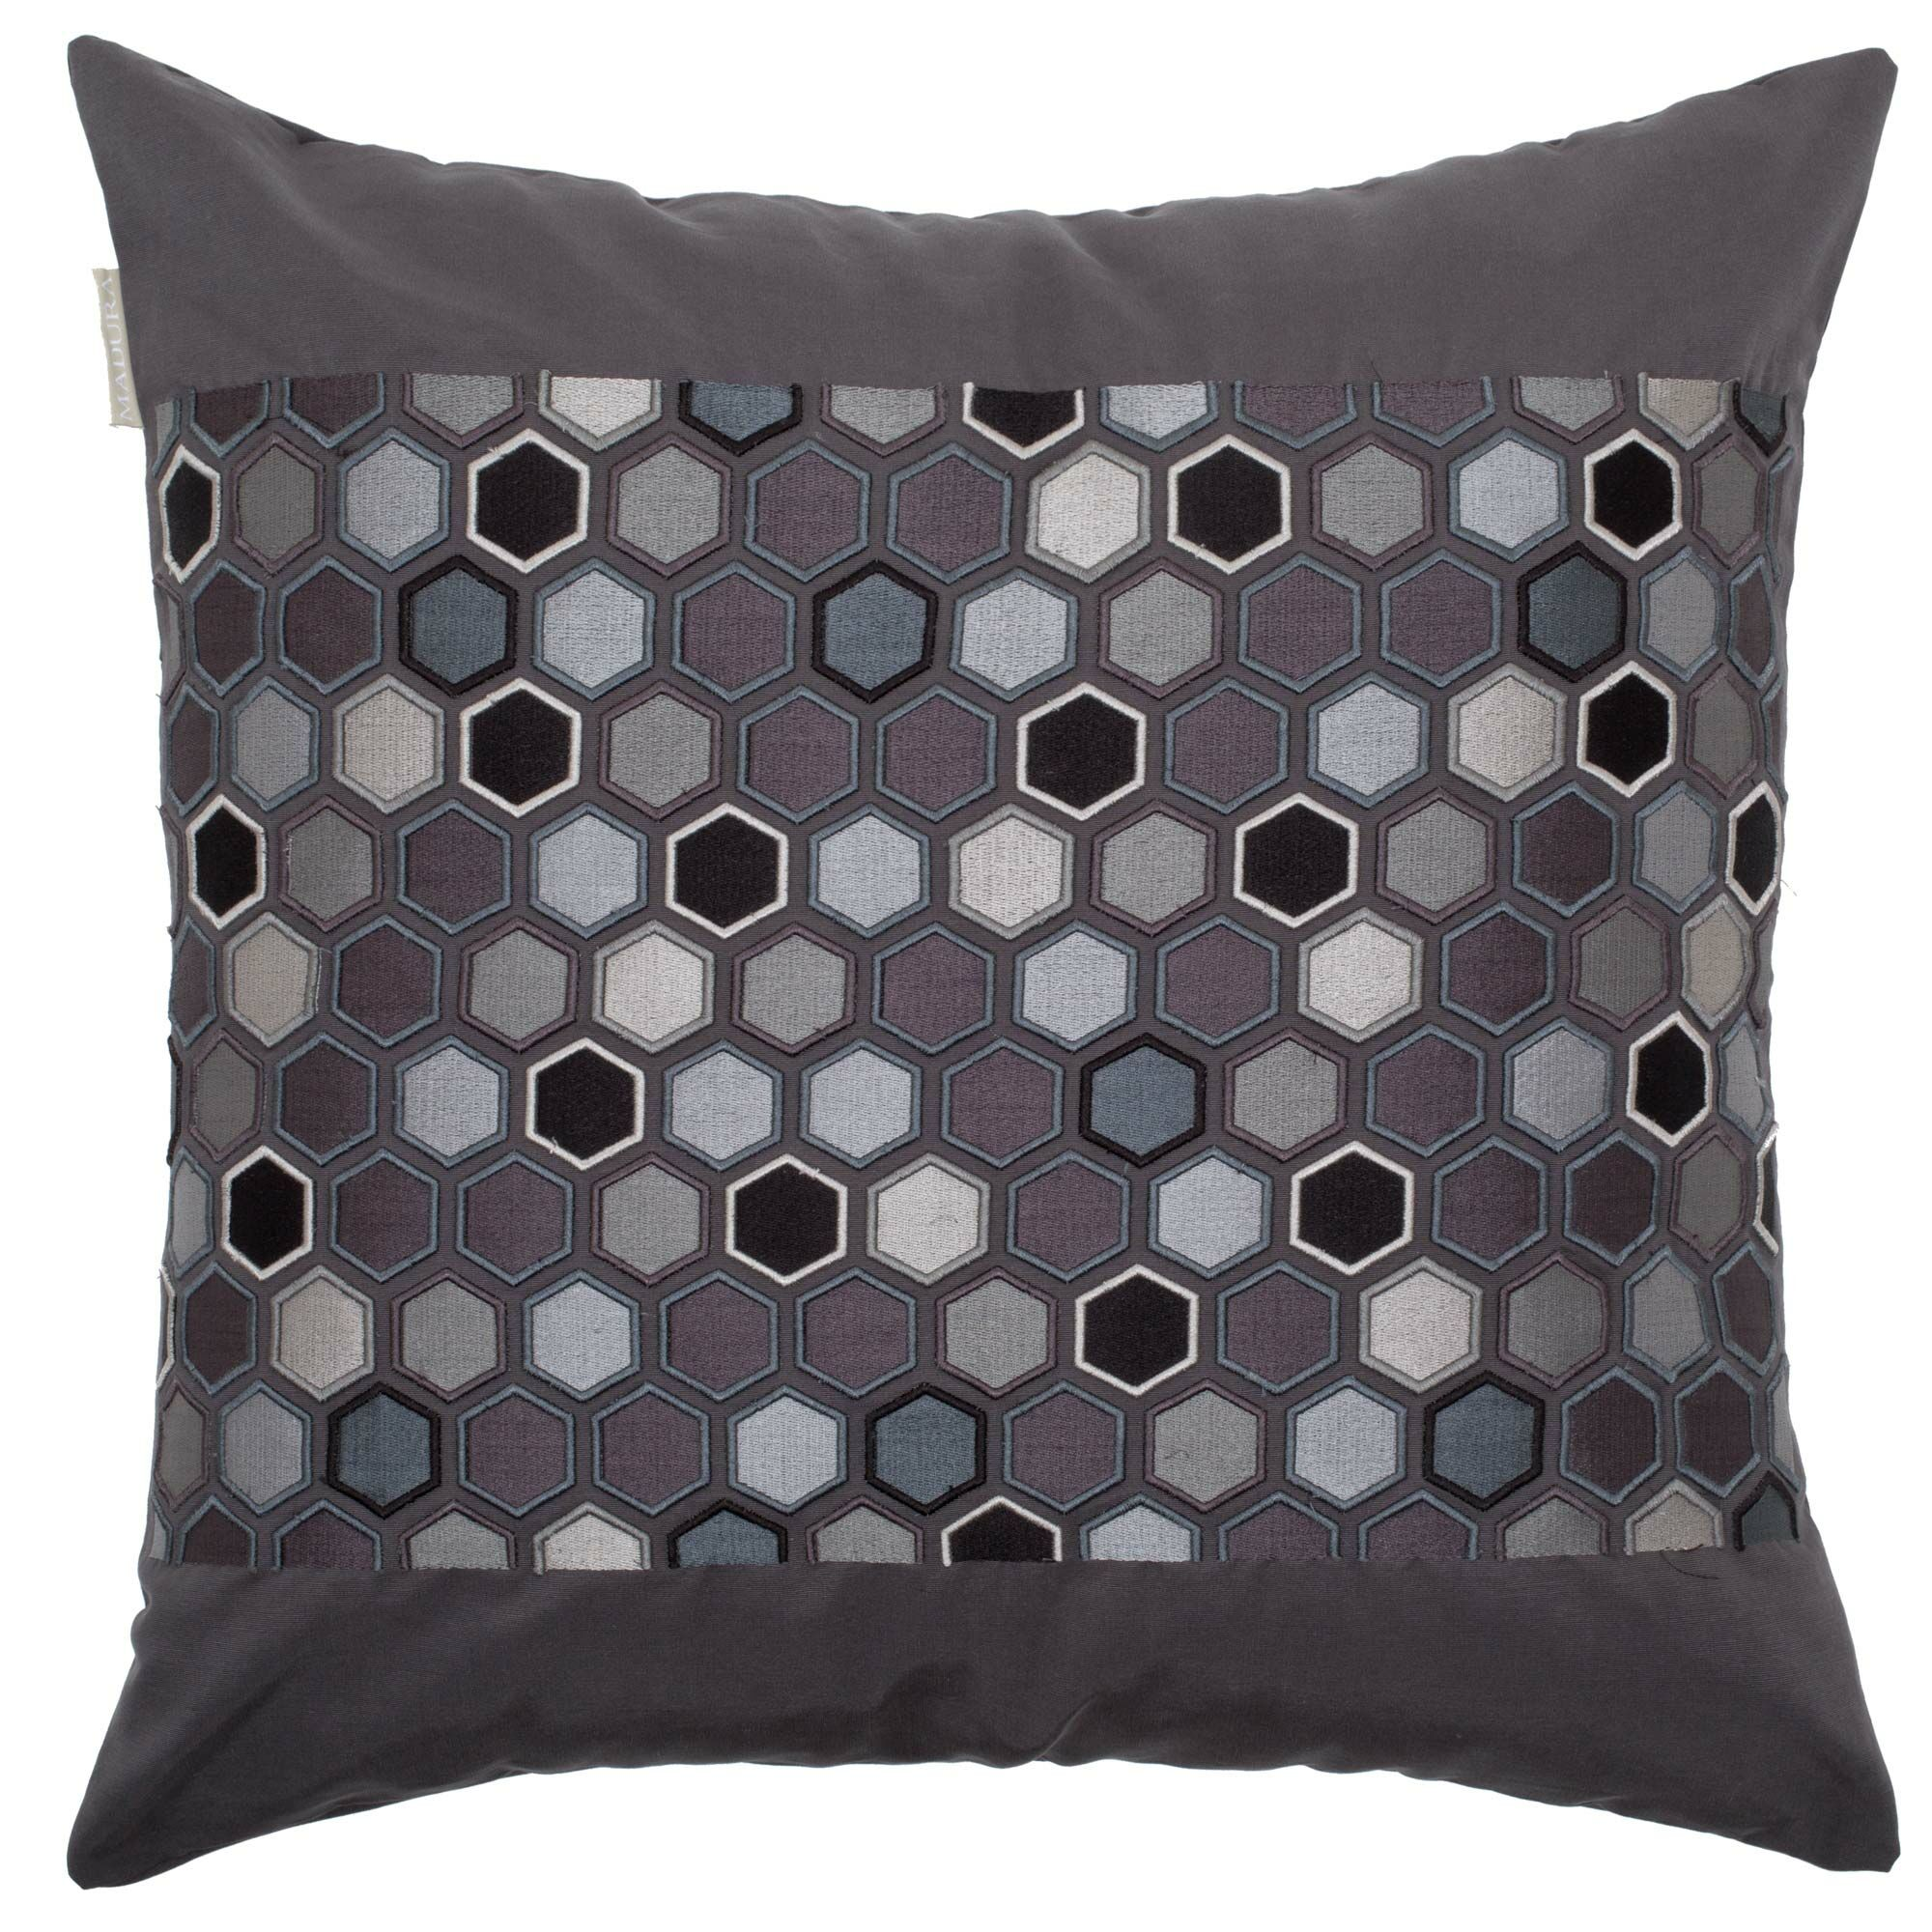 Honey Pillow Cover Color: Black